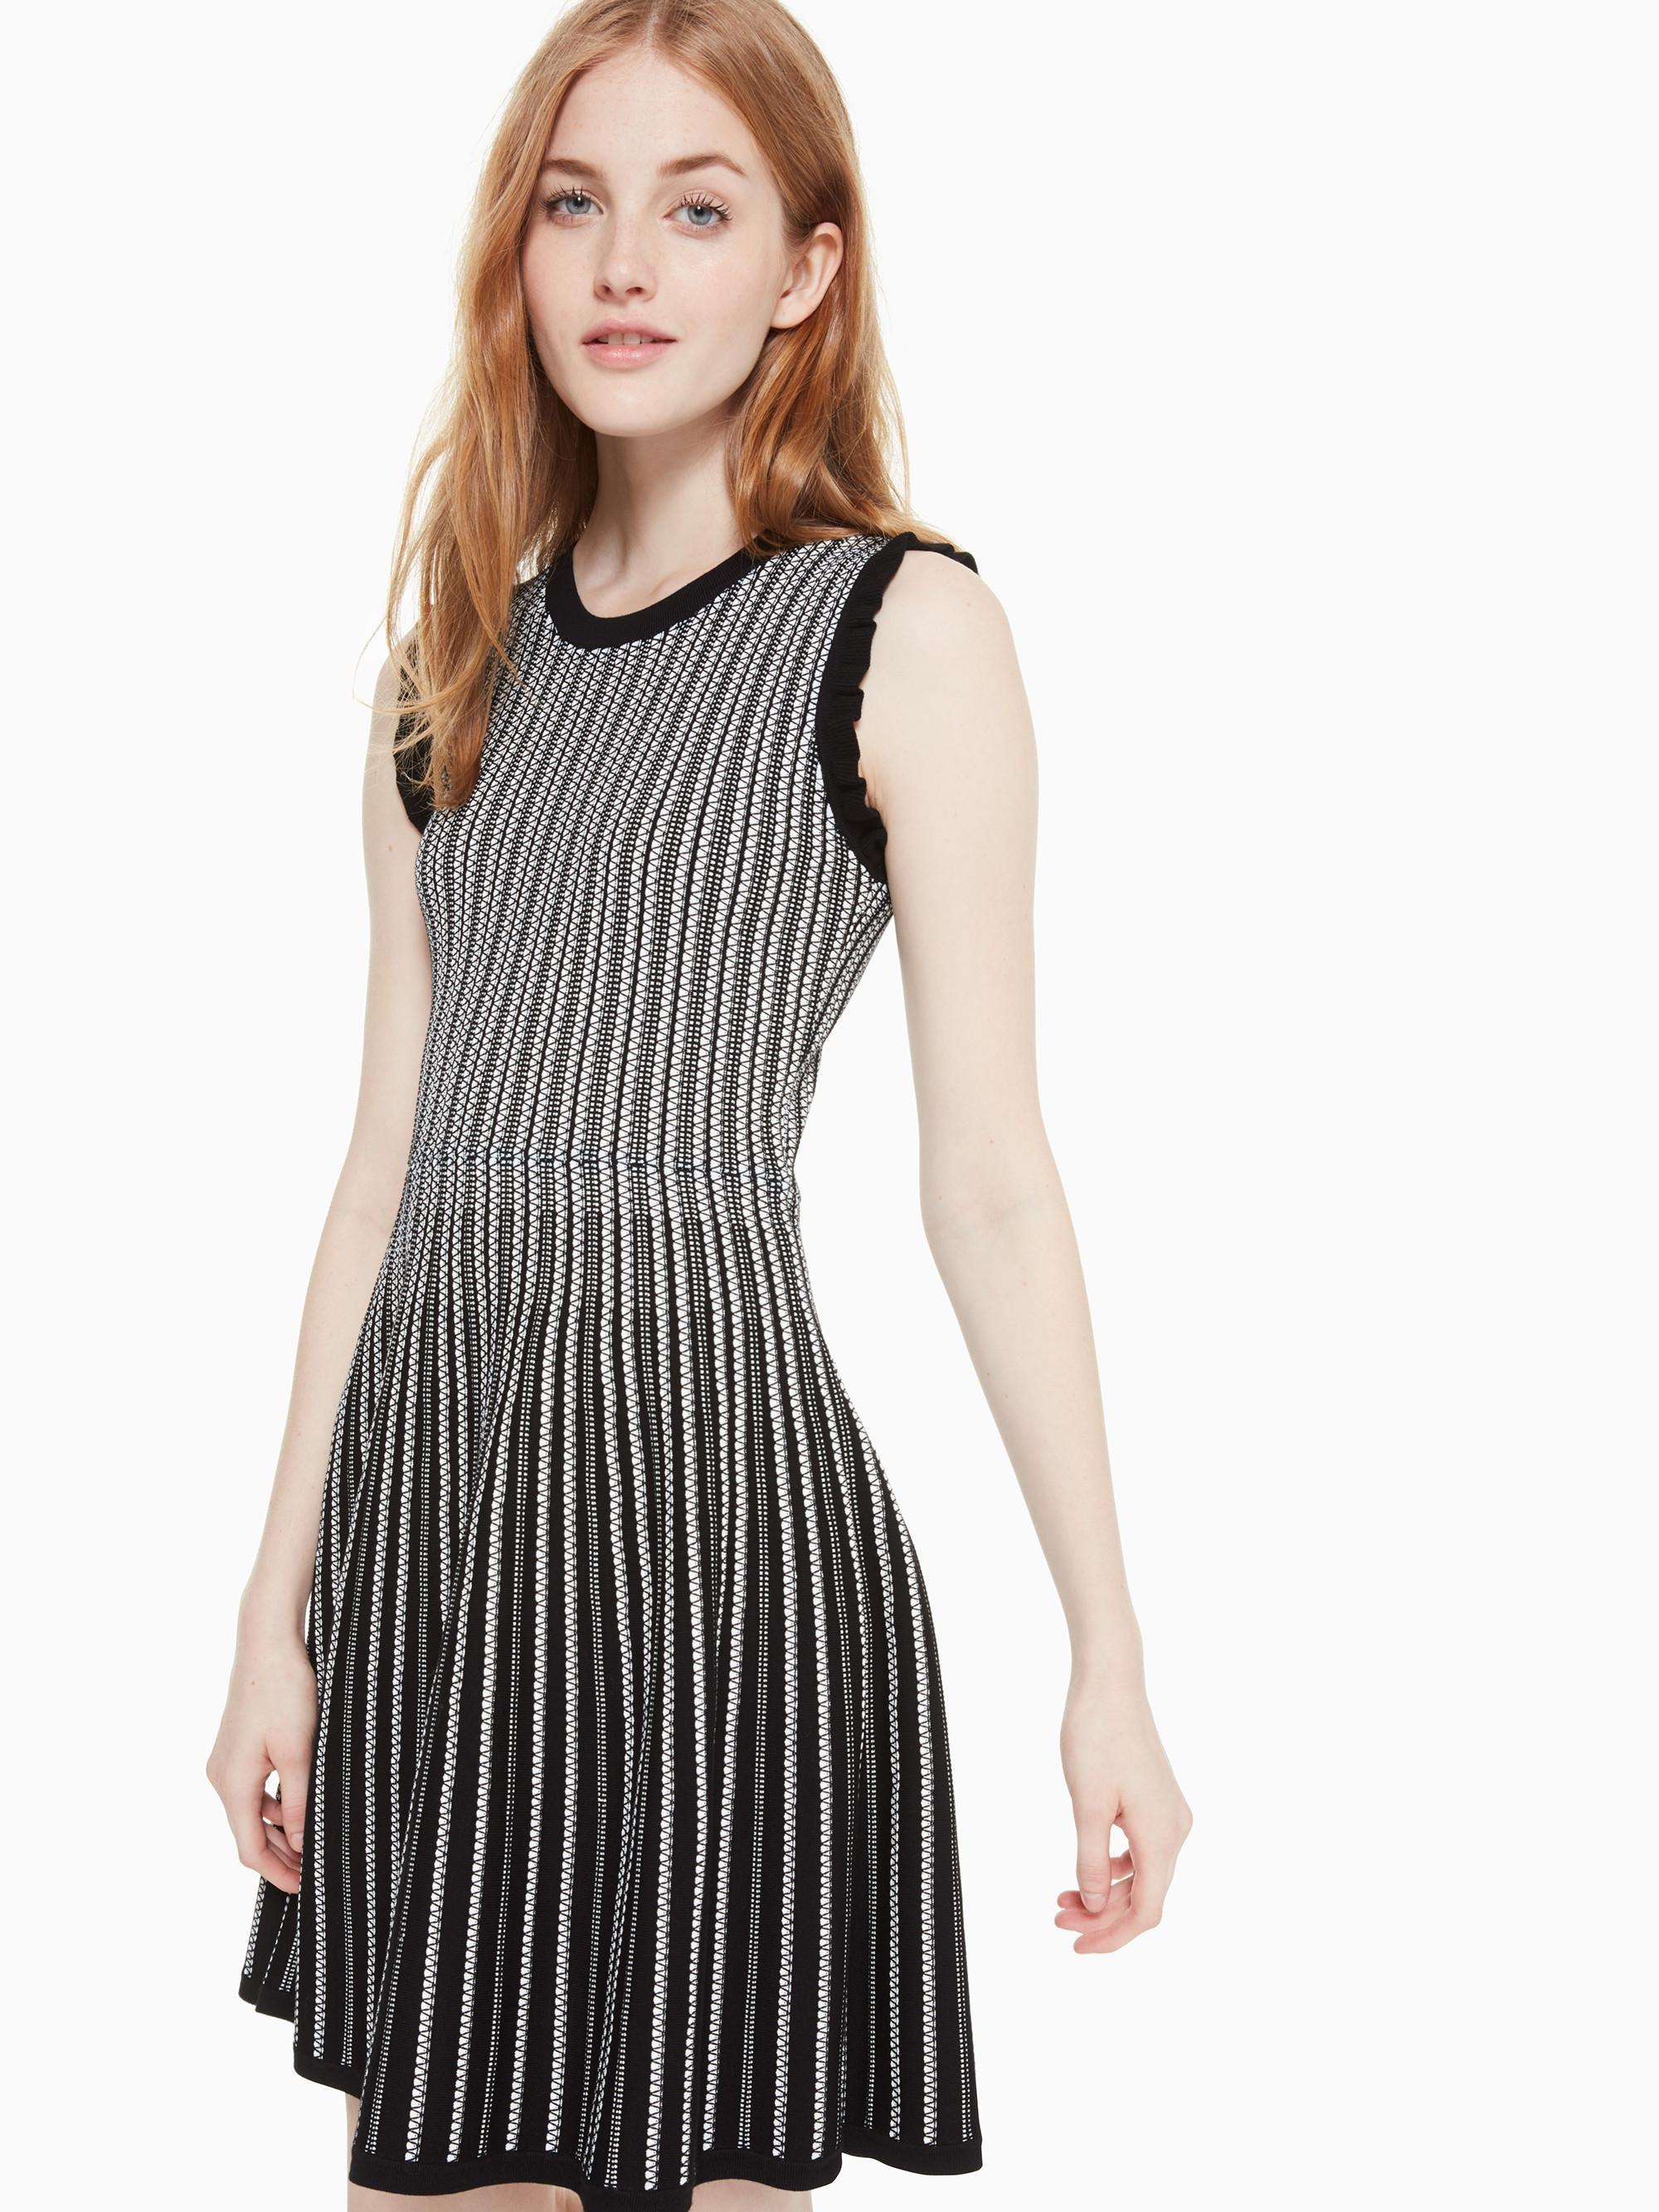 8f8b0997192 Kate Spade Textured Sweater Dress in Black - Lyst